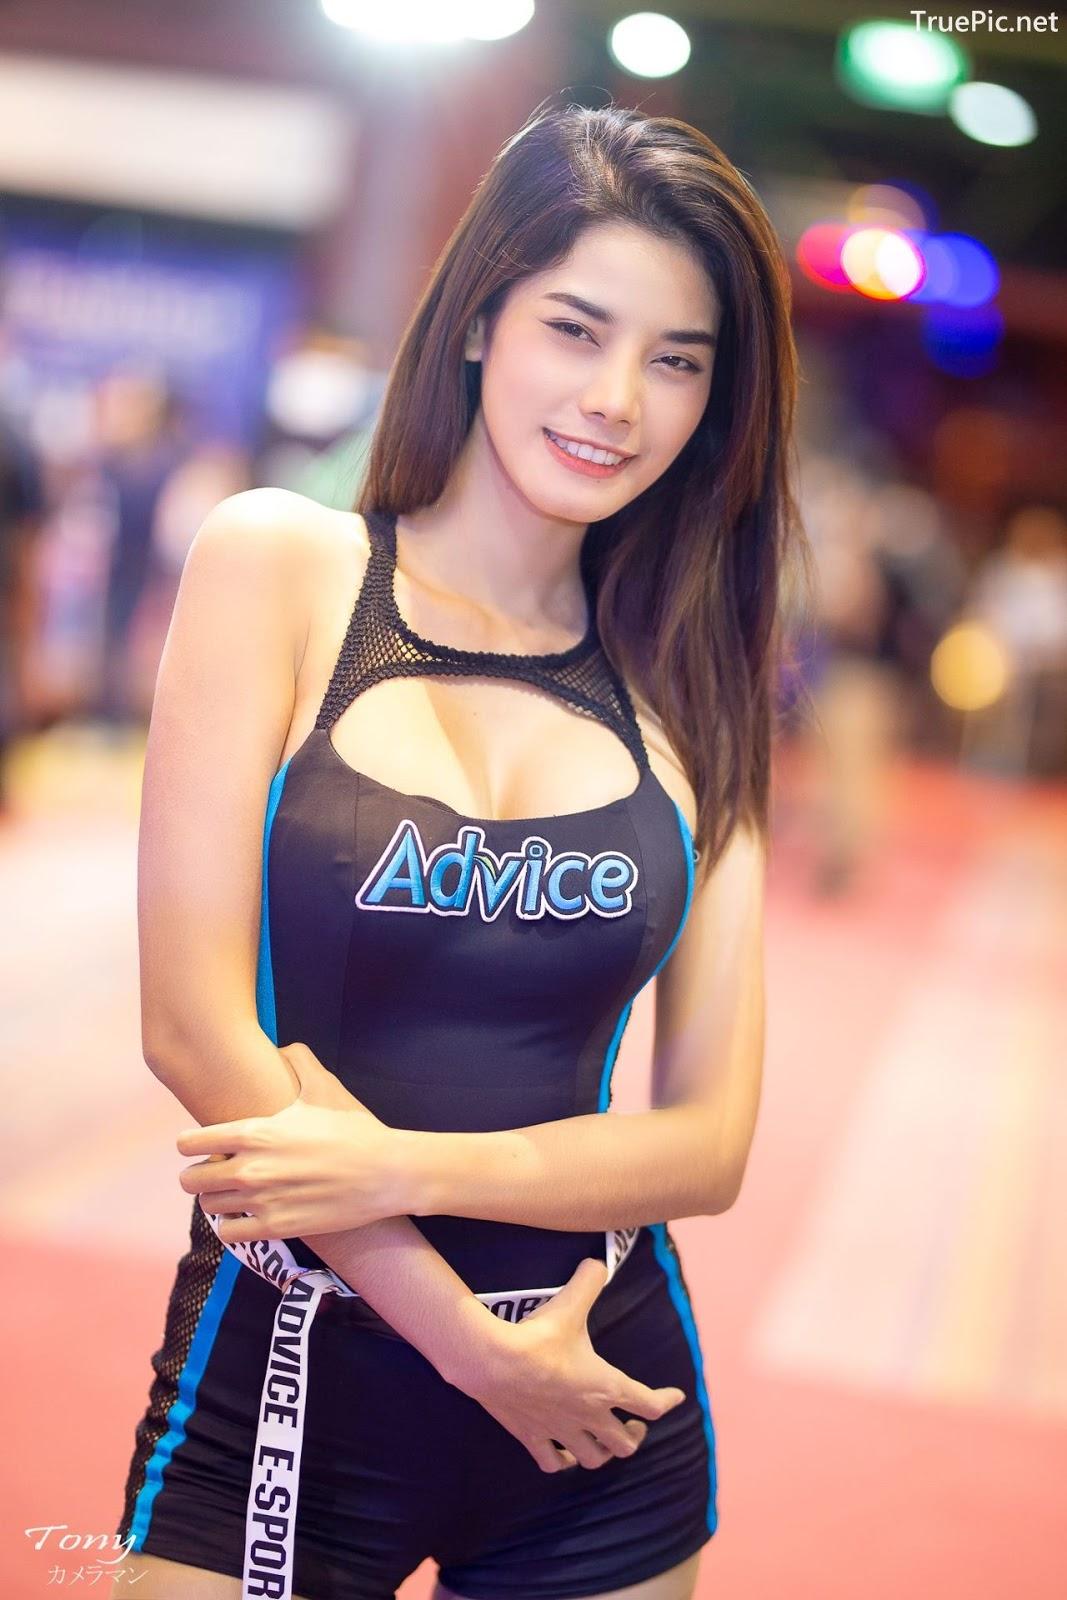 Image-Thailand-Hot-Model-Thai-PG-At-Commart-2018-TruePic.net- Picture-41